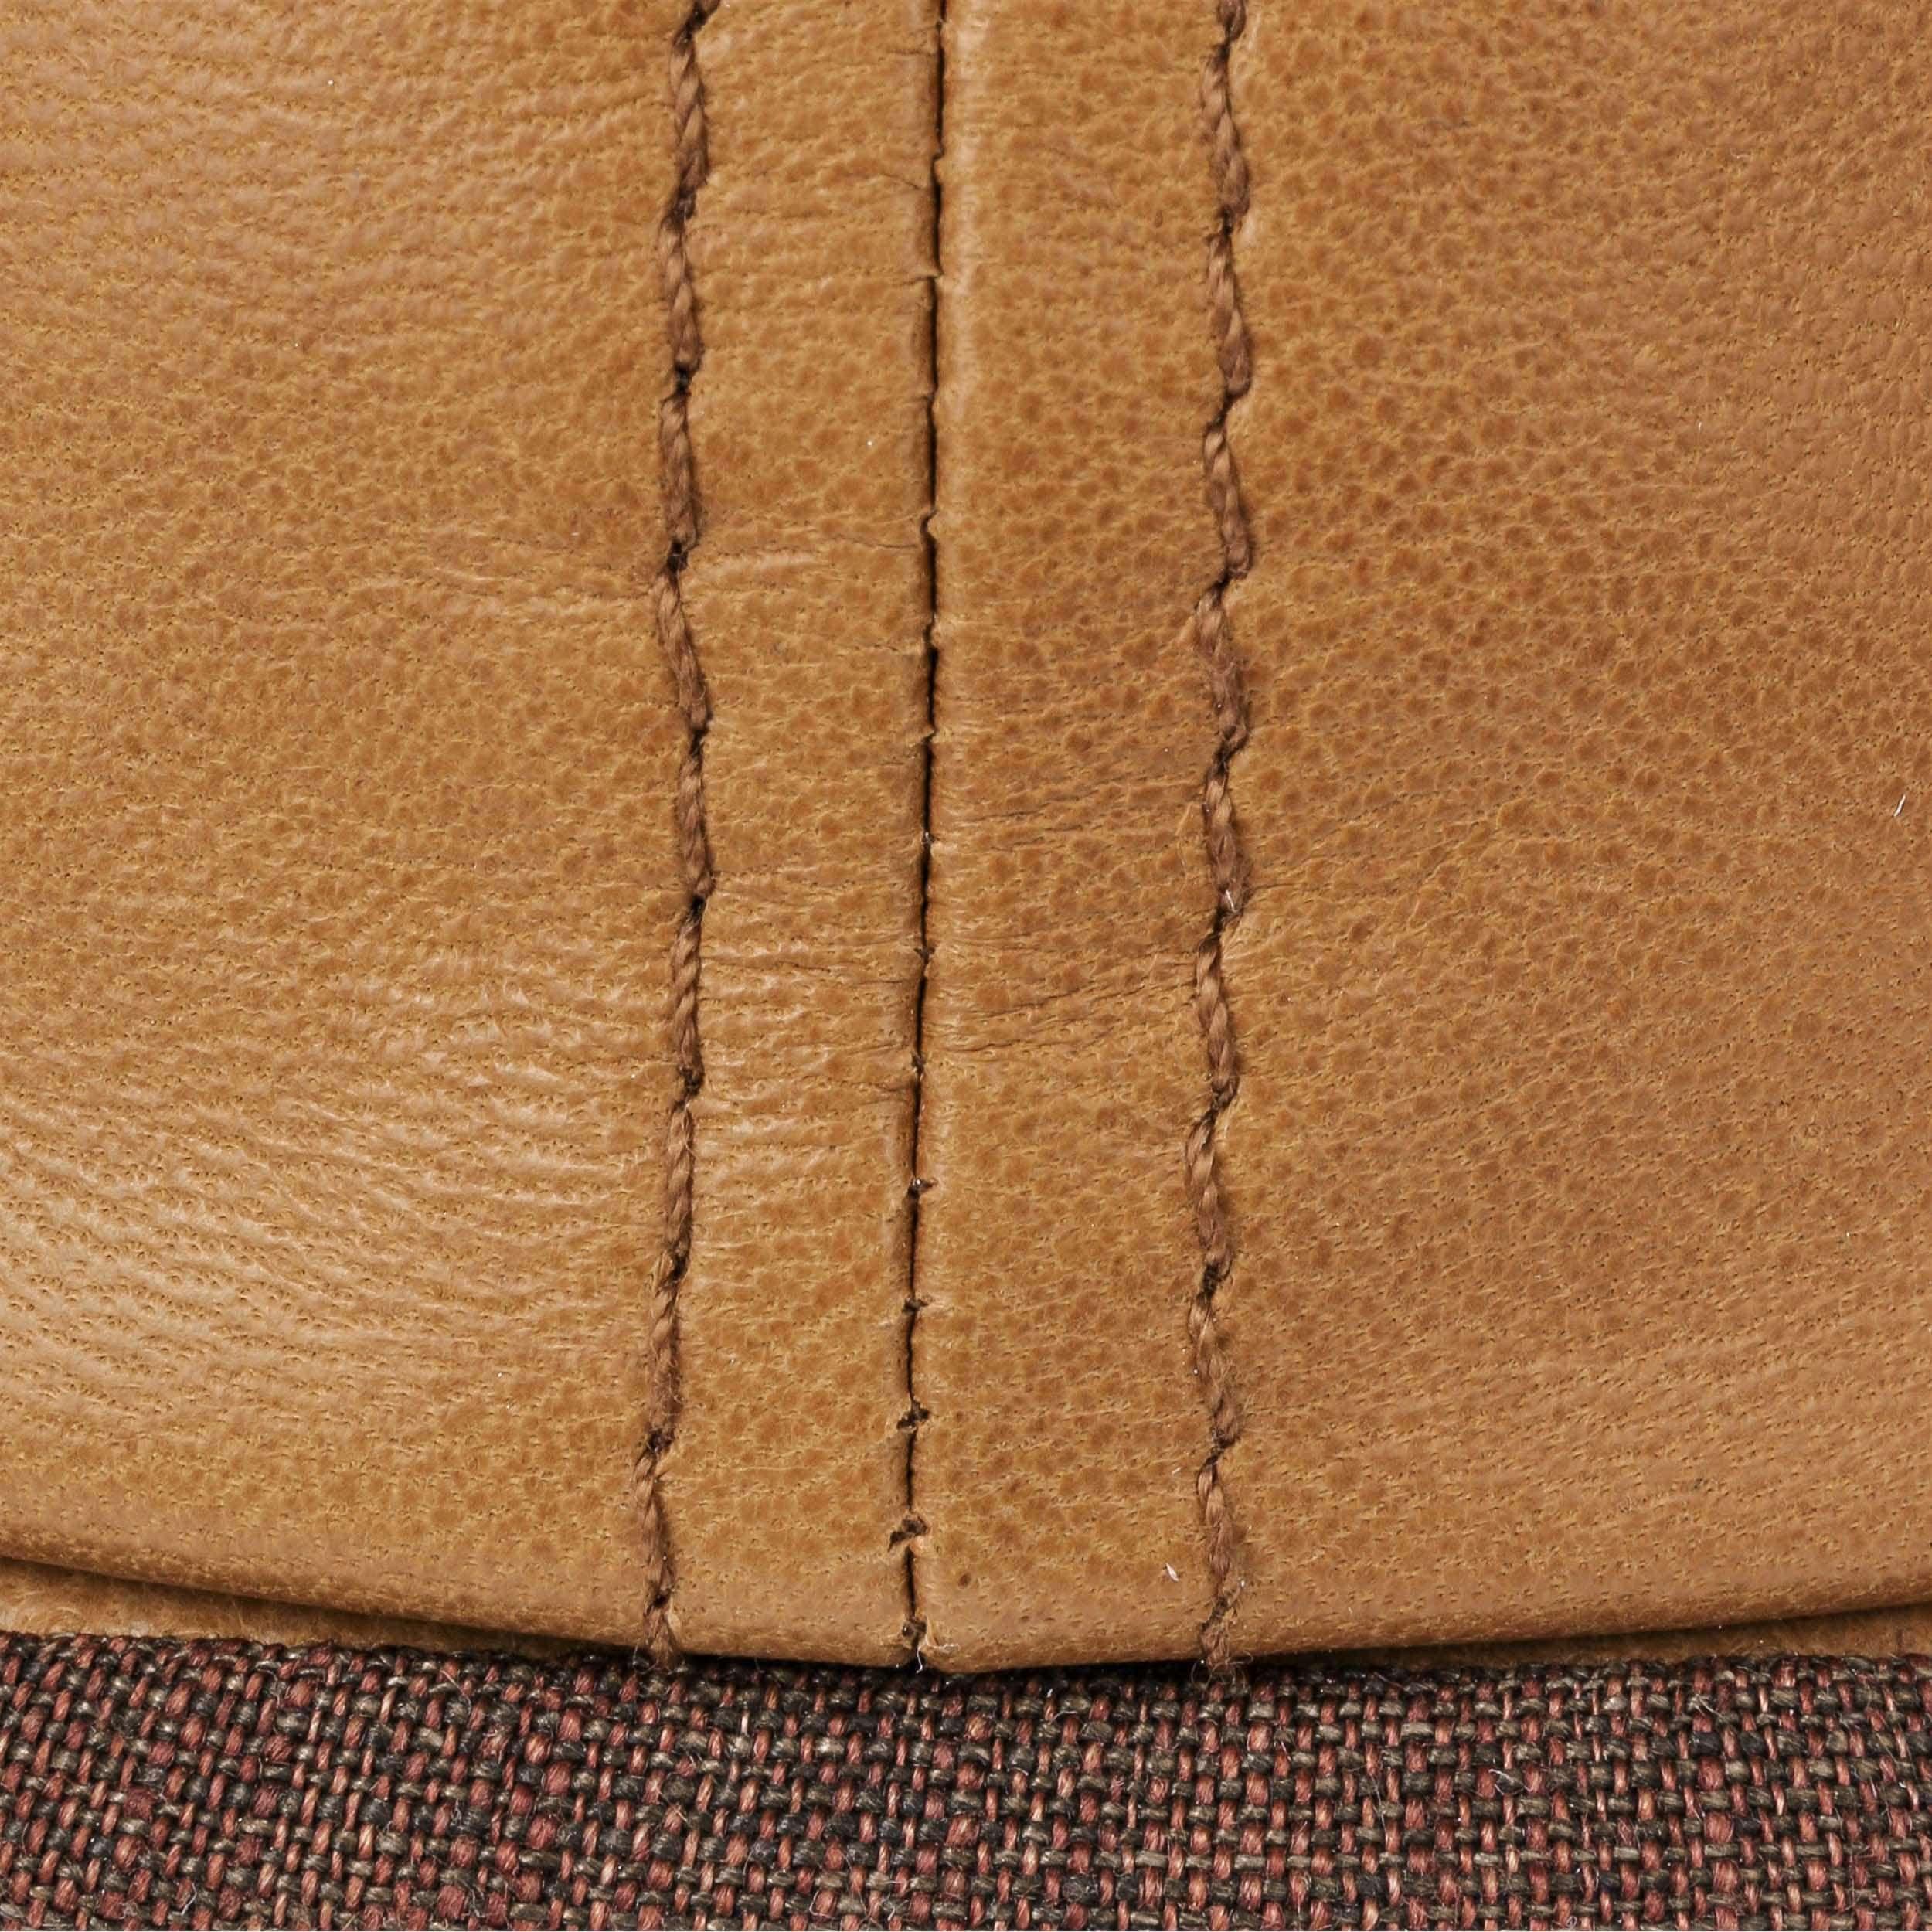 Brooklin 6 Panel Leather Flat Cap cognac